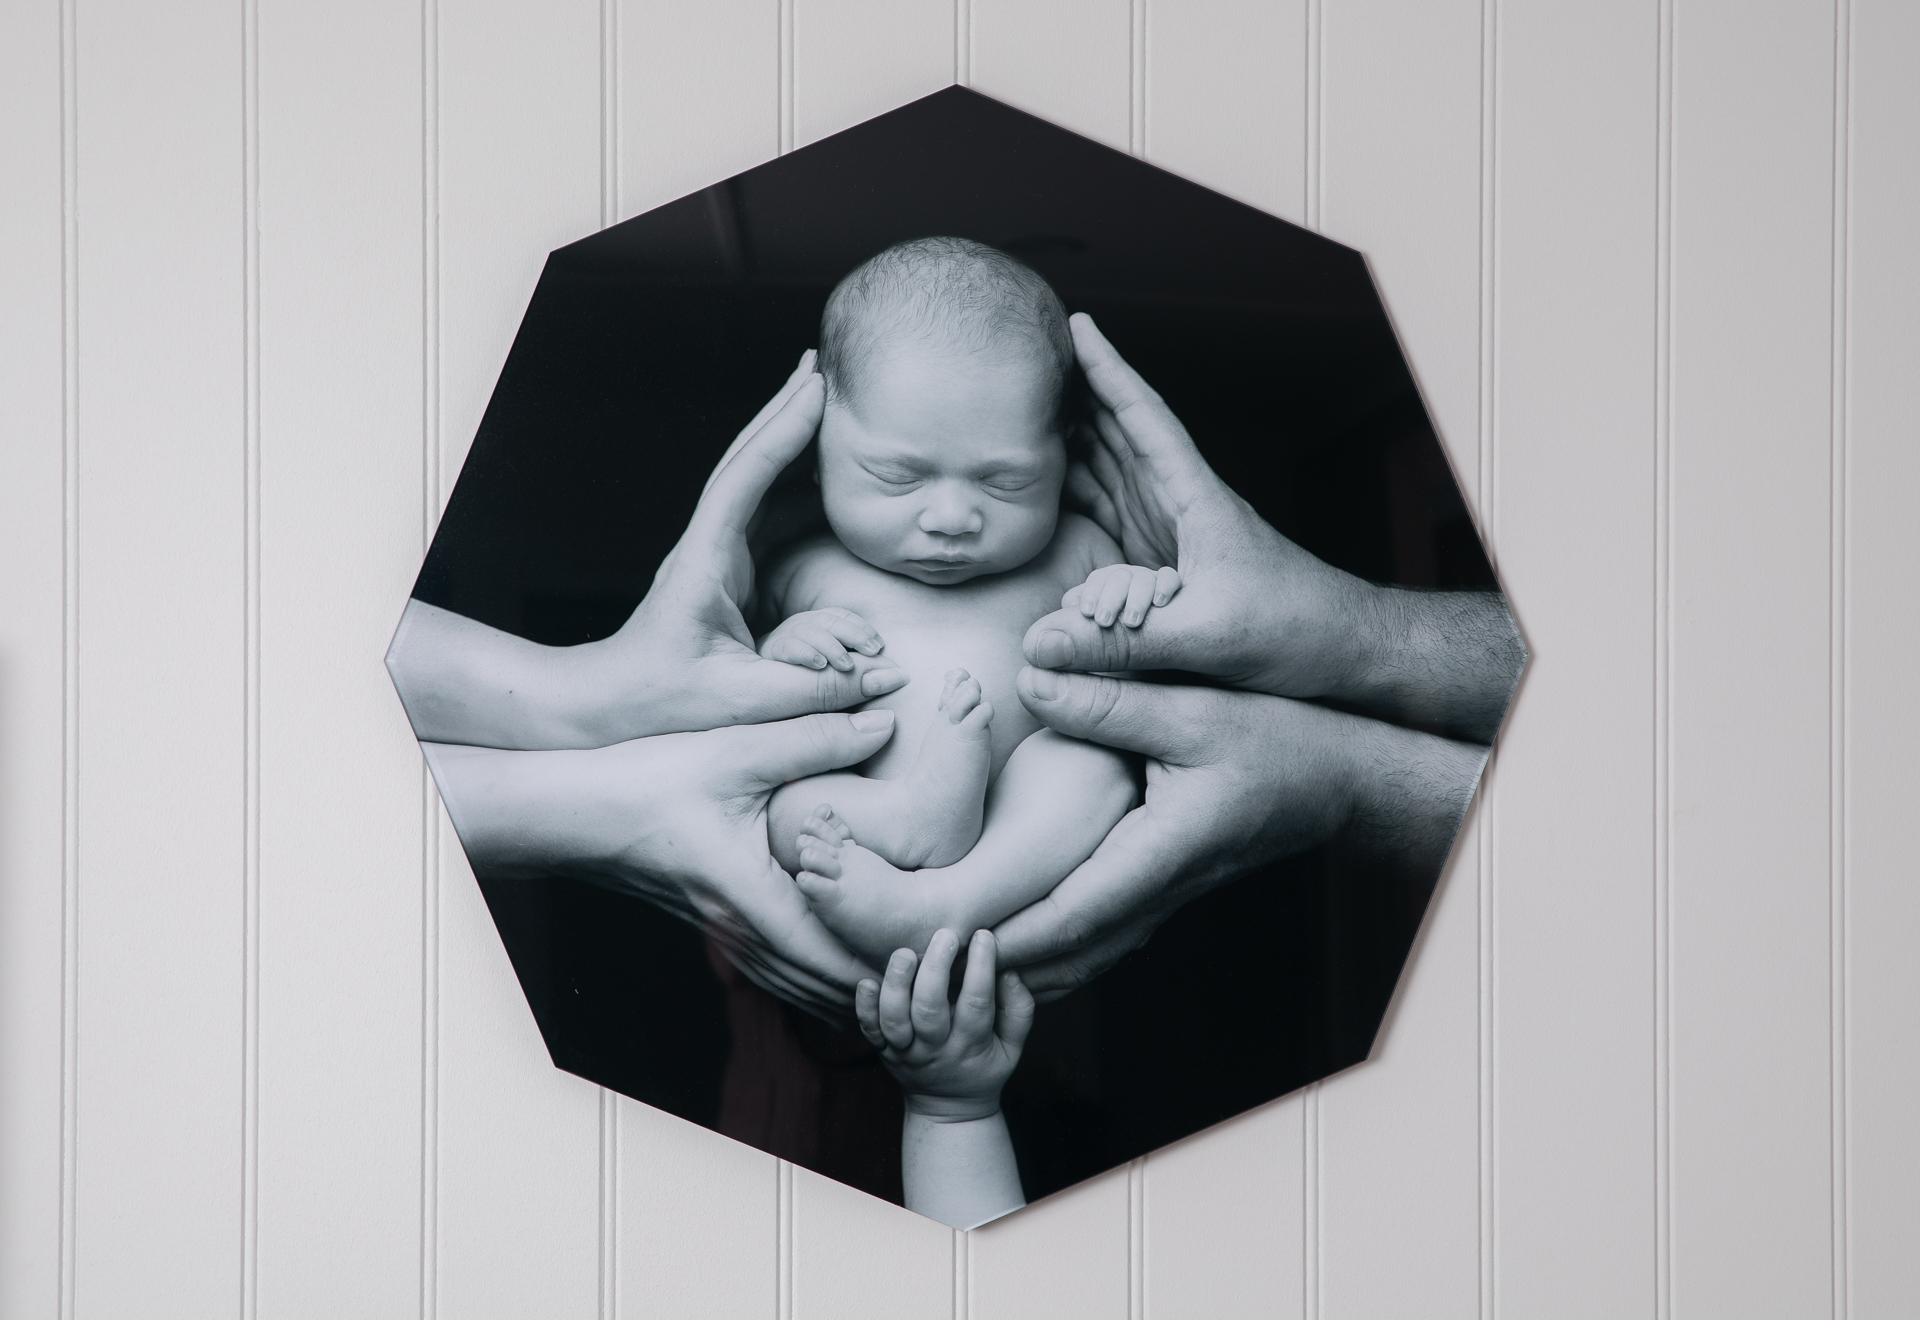 Product - acrylic frame black and white photo